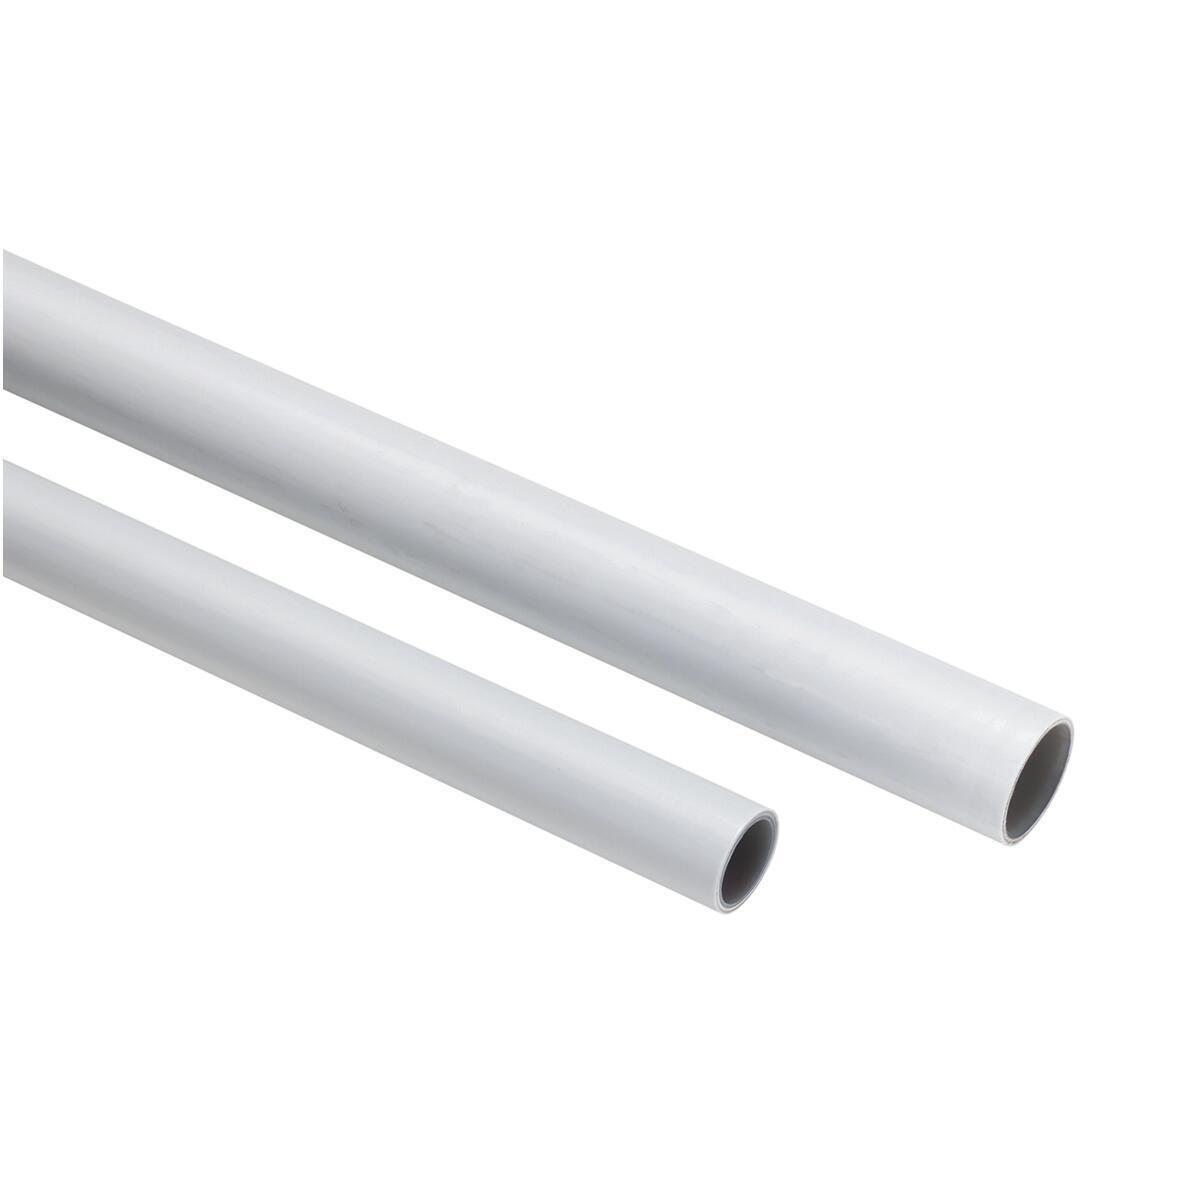 Tubo in barre multistrato nudo EMMETI Ø 16 mm x L 2 m - 2